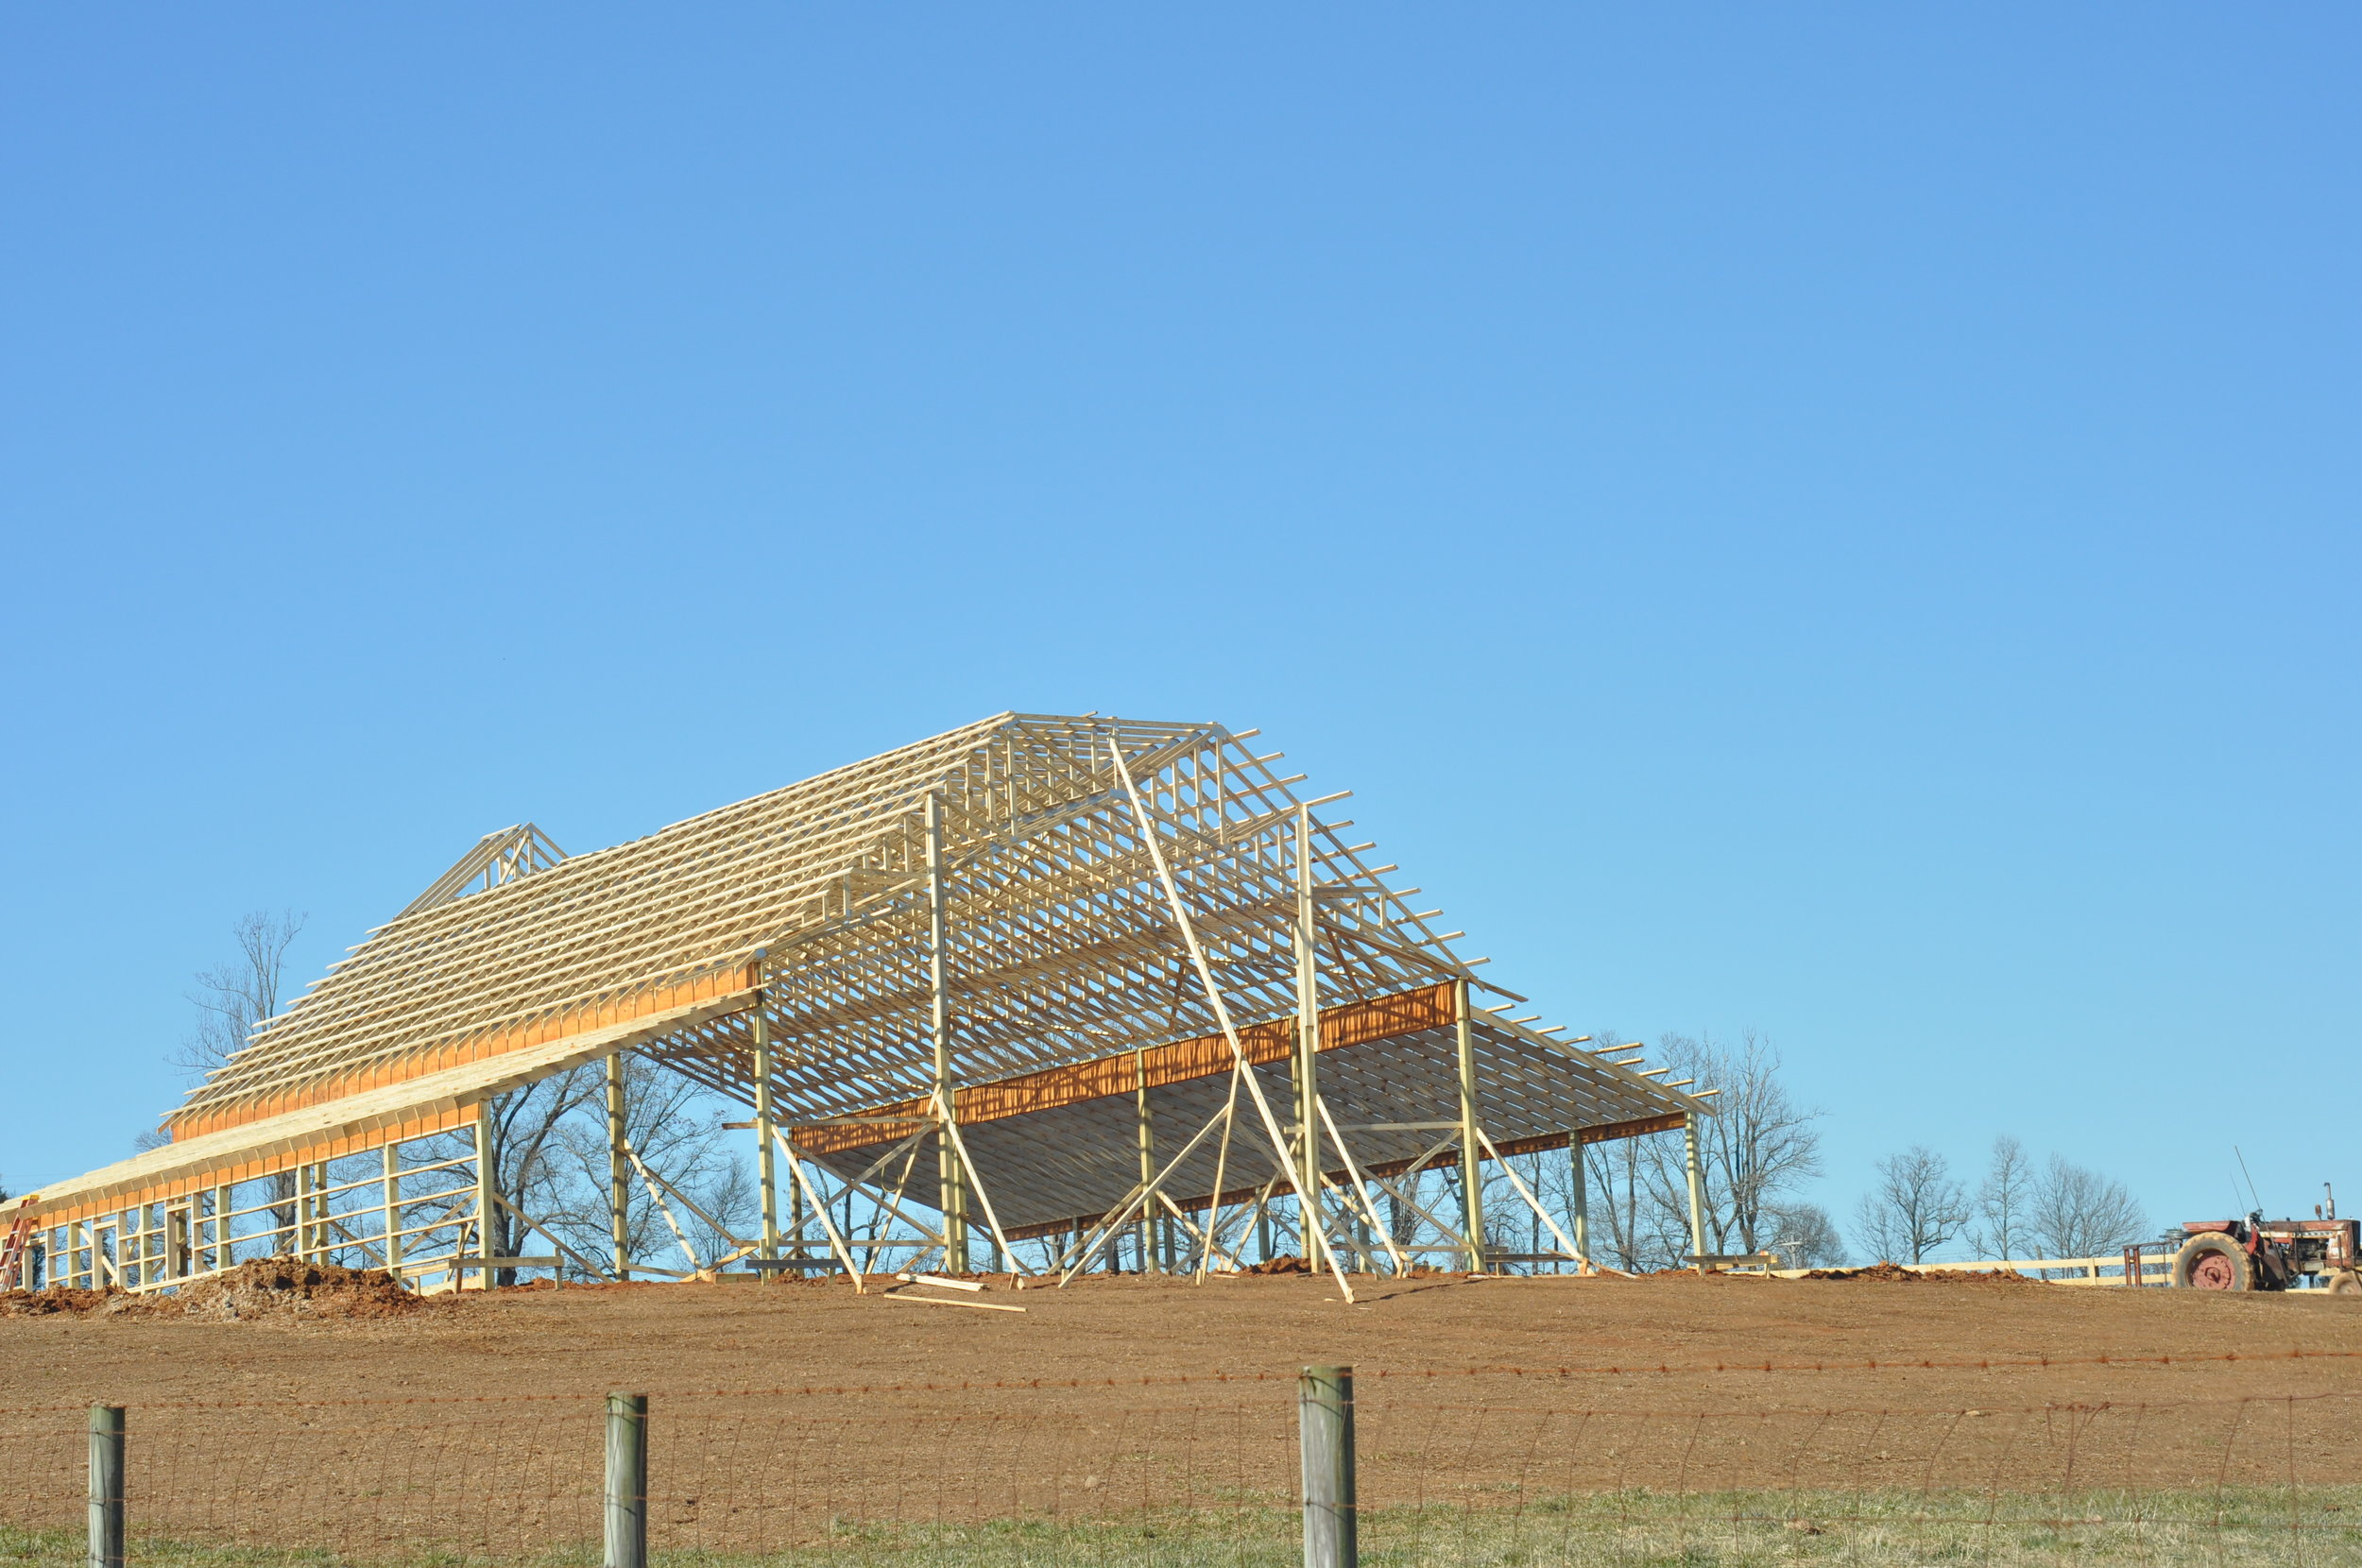 The Barn's frame on February 13, 2010